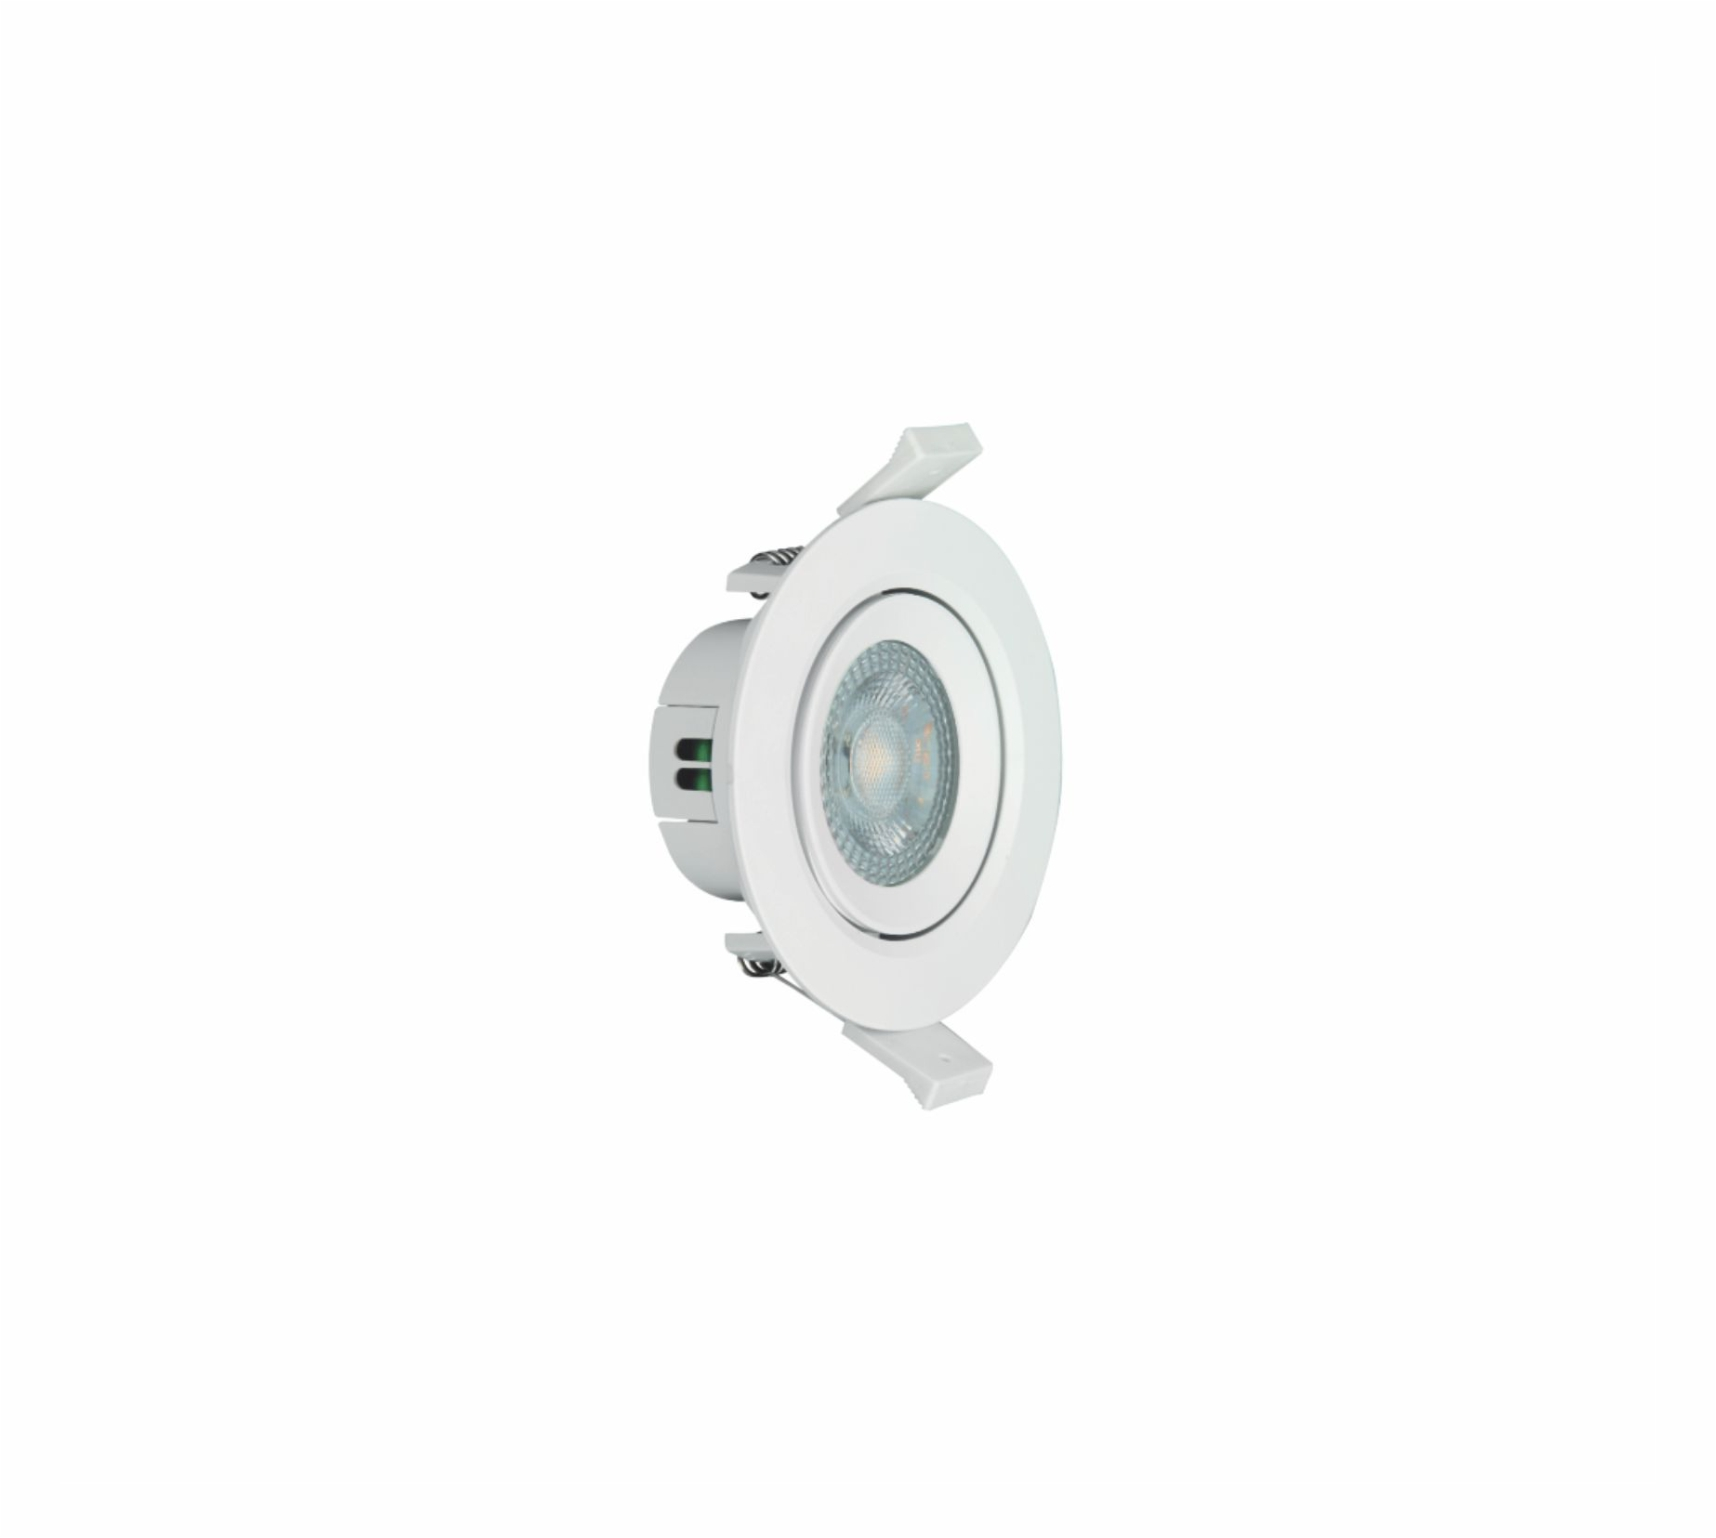 SPOT LED MR11 redondo branco 3,5W AUTOVOLT 3000K